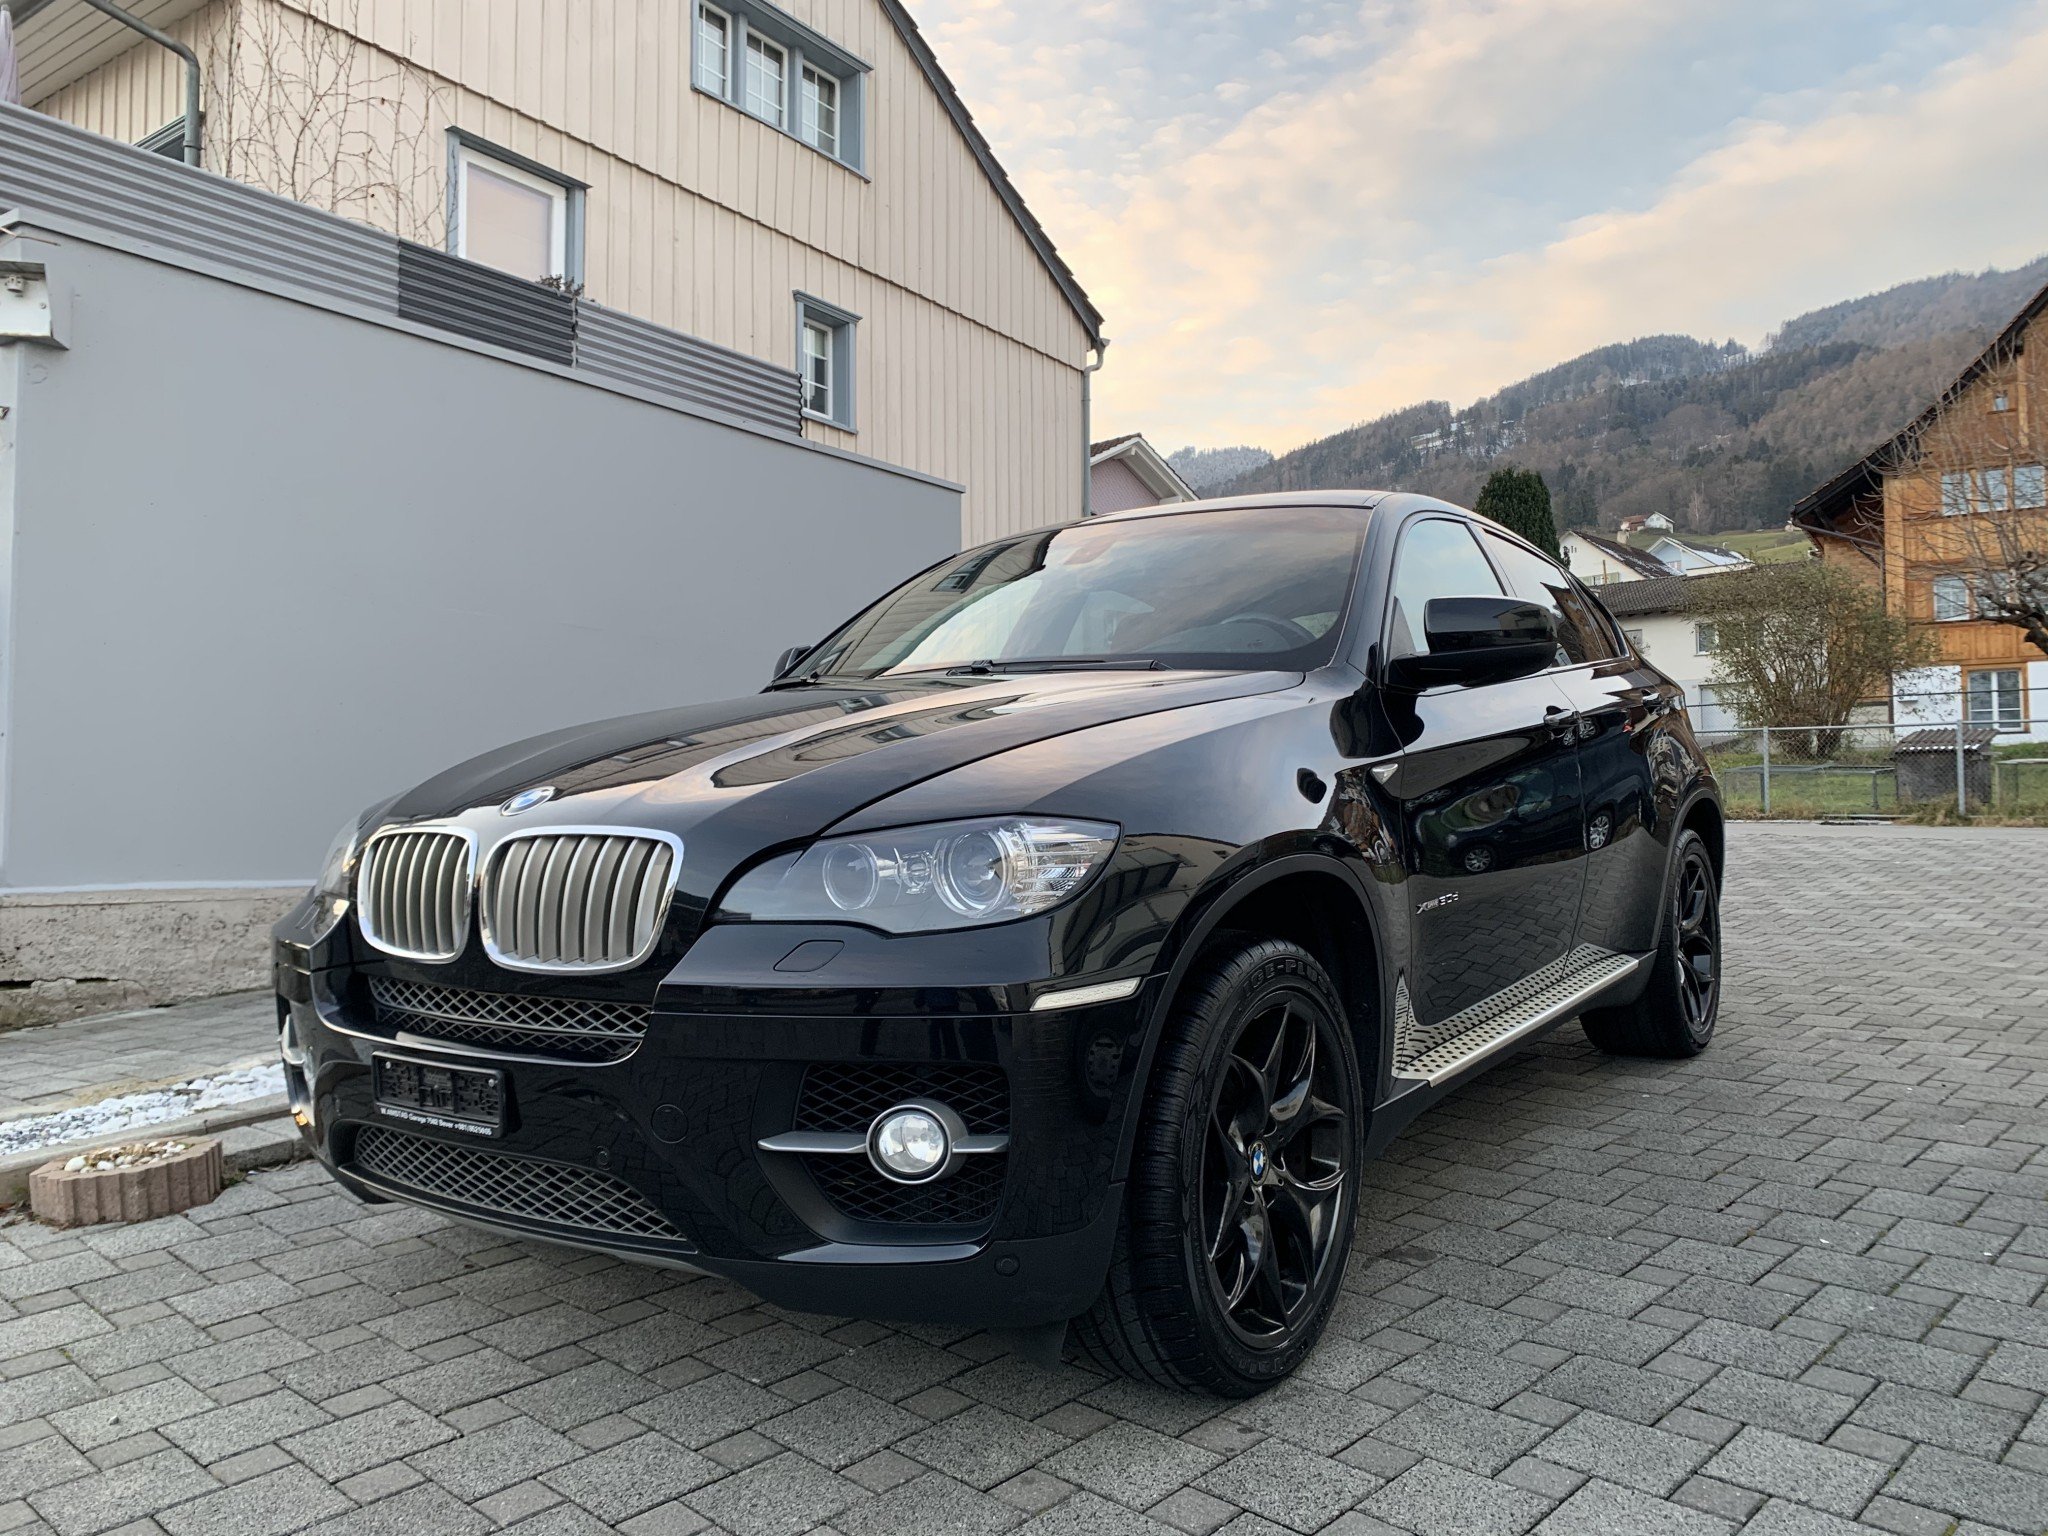 suv BMW X6 E71 xDrive 30d